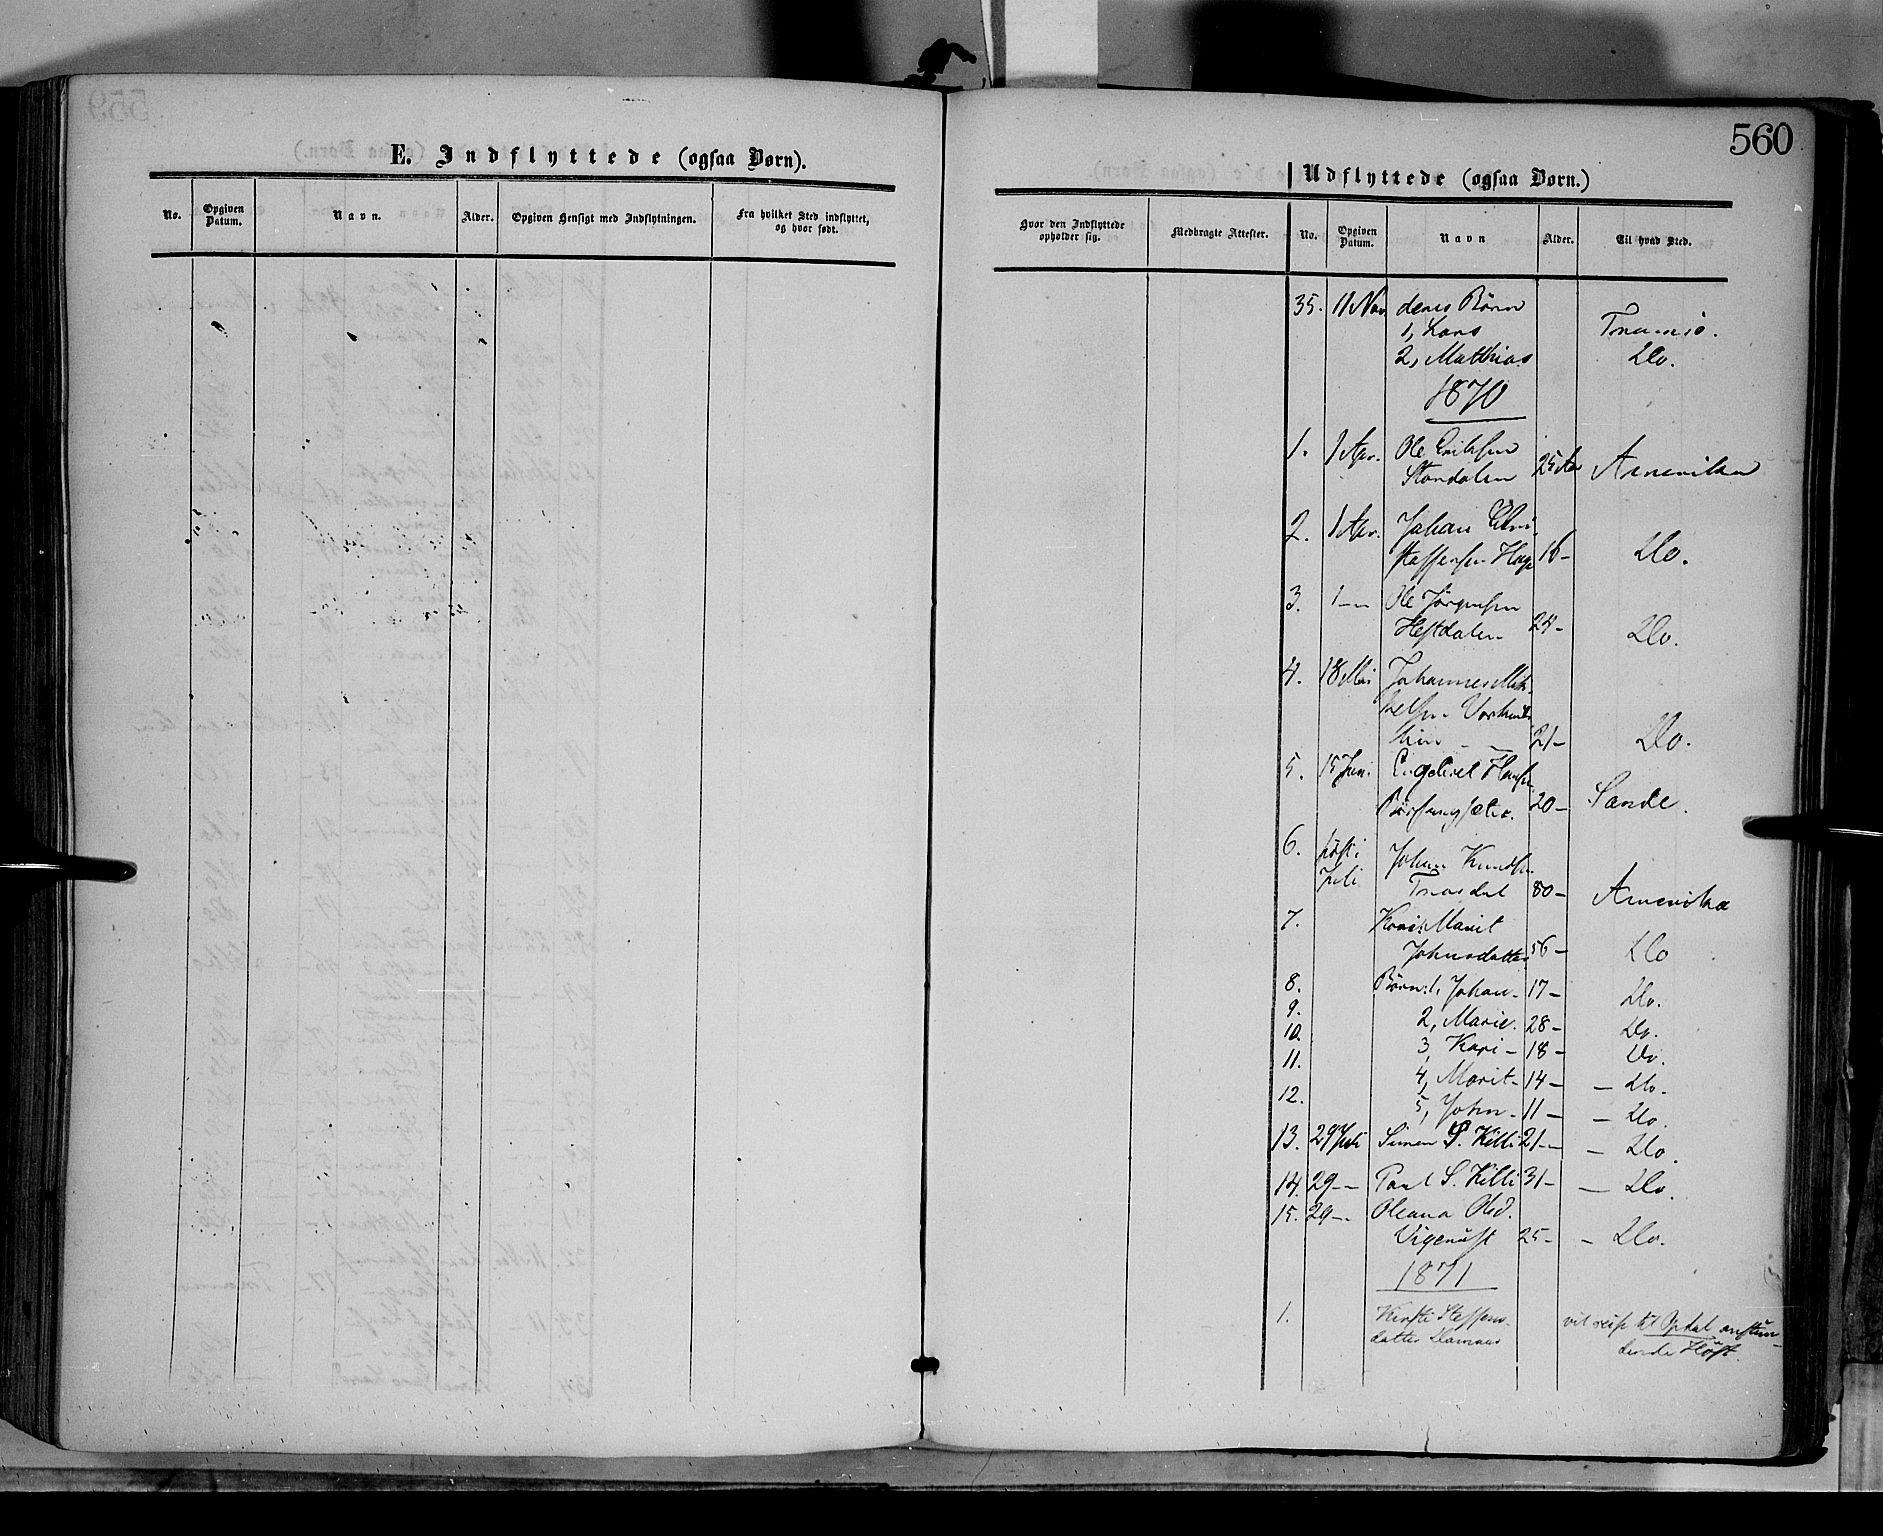 SAH, Dovre prestekontor, Ministerialbok nr. 1, 1854-1878, s. 560